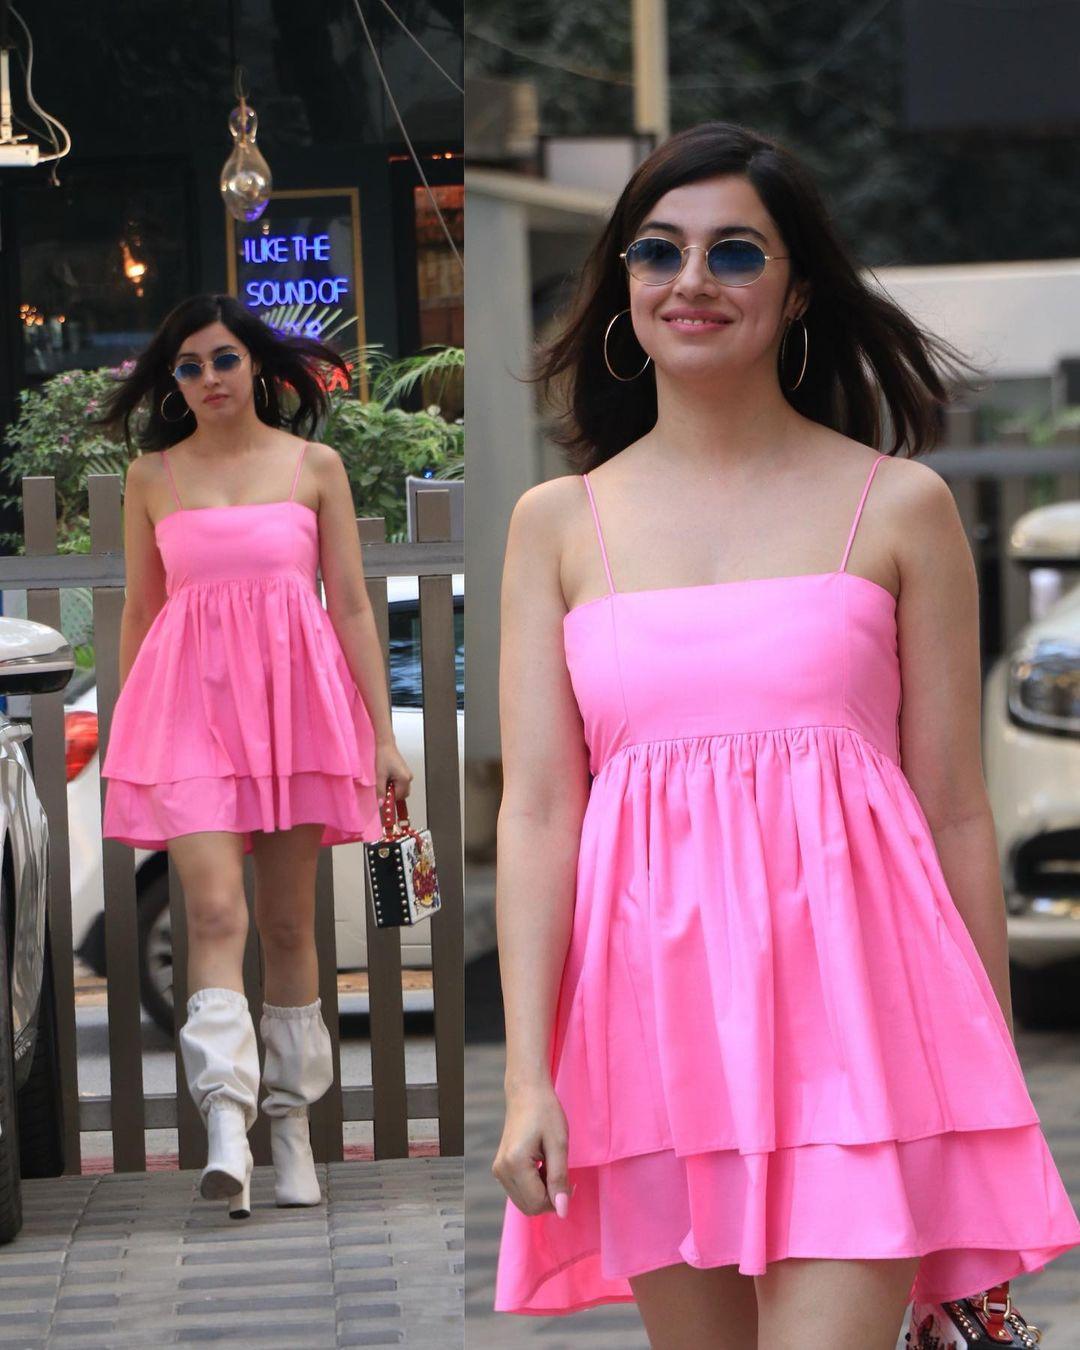 Divya Khosla Kumar opts for a bubblepink summer dress (Photo: Instagram / DivyaKhoslaKumar)